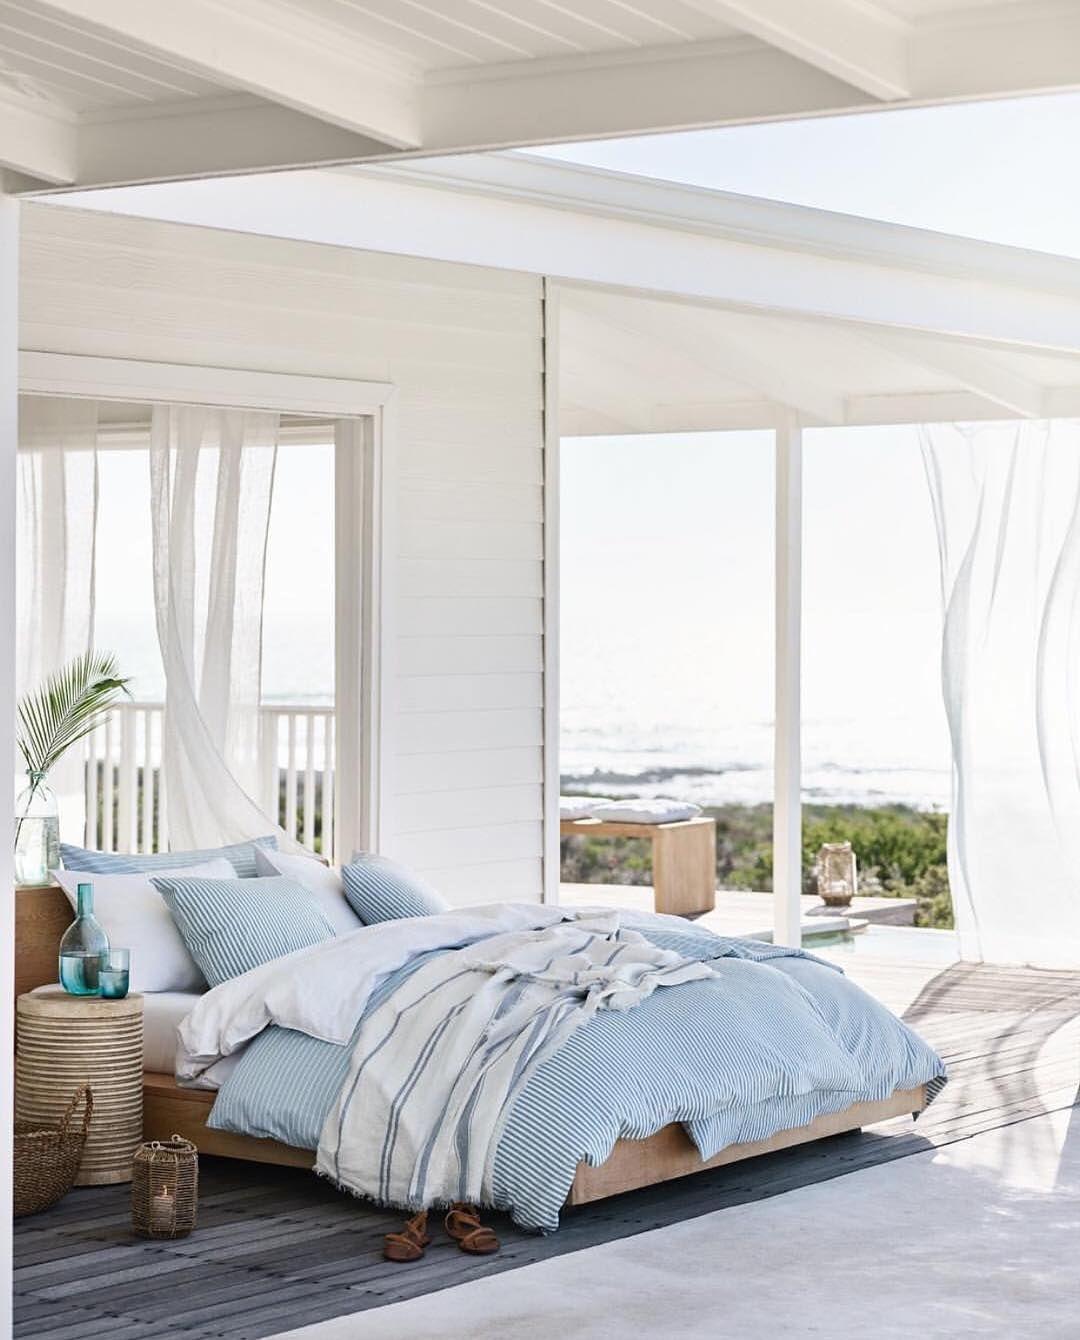 omme un air d'été 🌾💭 hmhom   Bedroom decor design, Bedroom ...